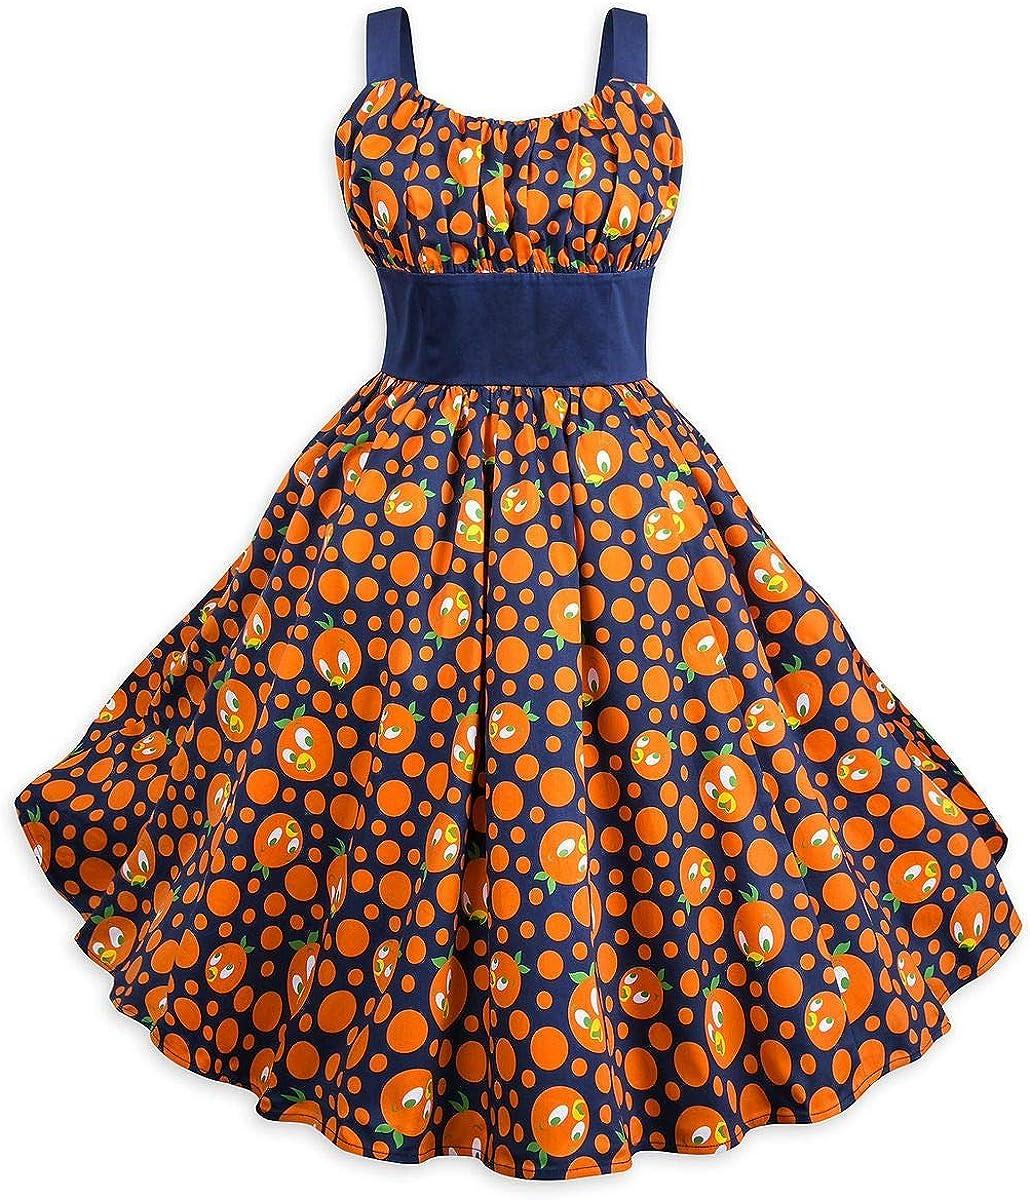 New Disney Parks The Dress Shop Youth Enchanted Tiki Room Birds Dress XXS-XL